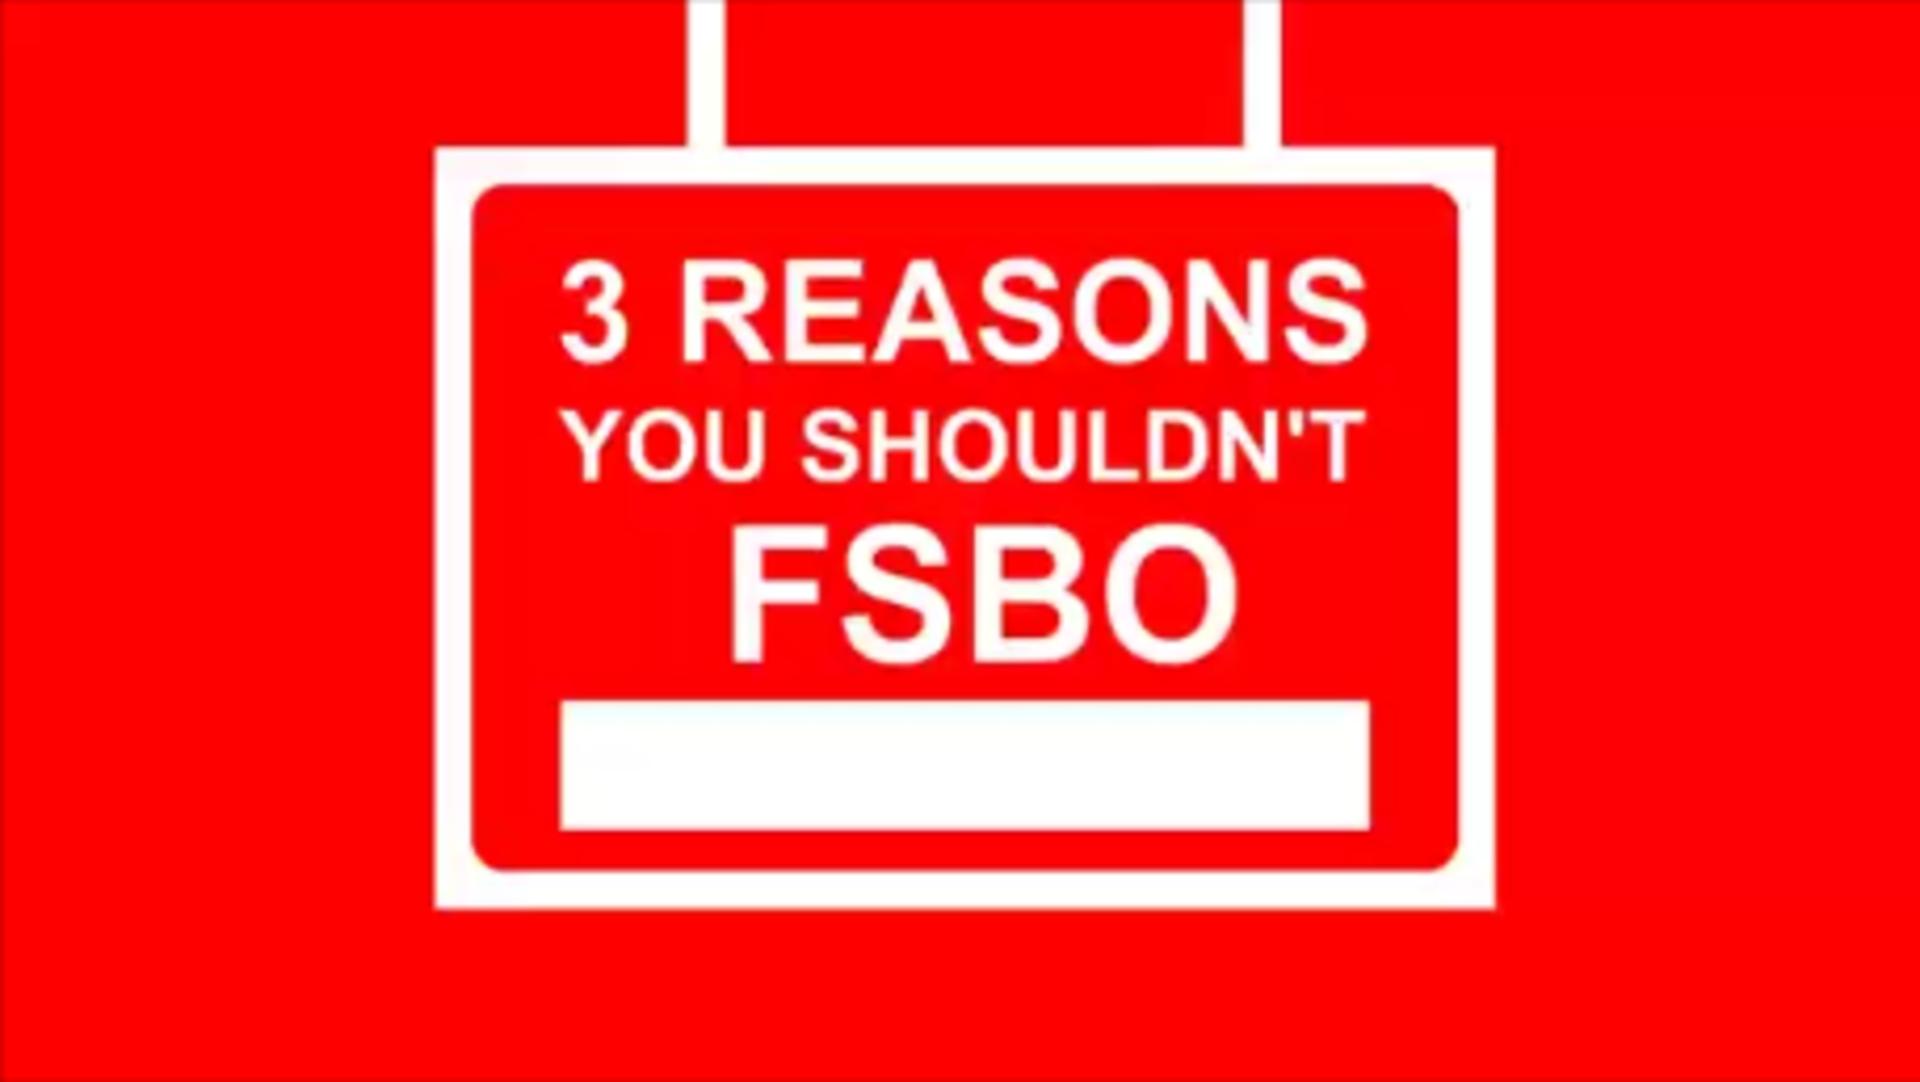 3 Reasons You Shouldn't FSBO